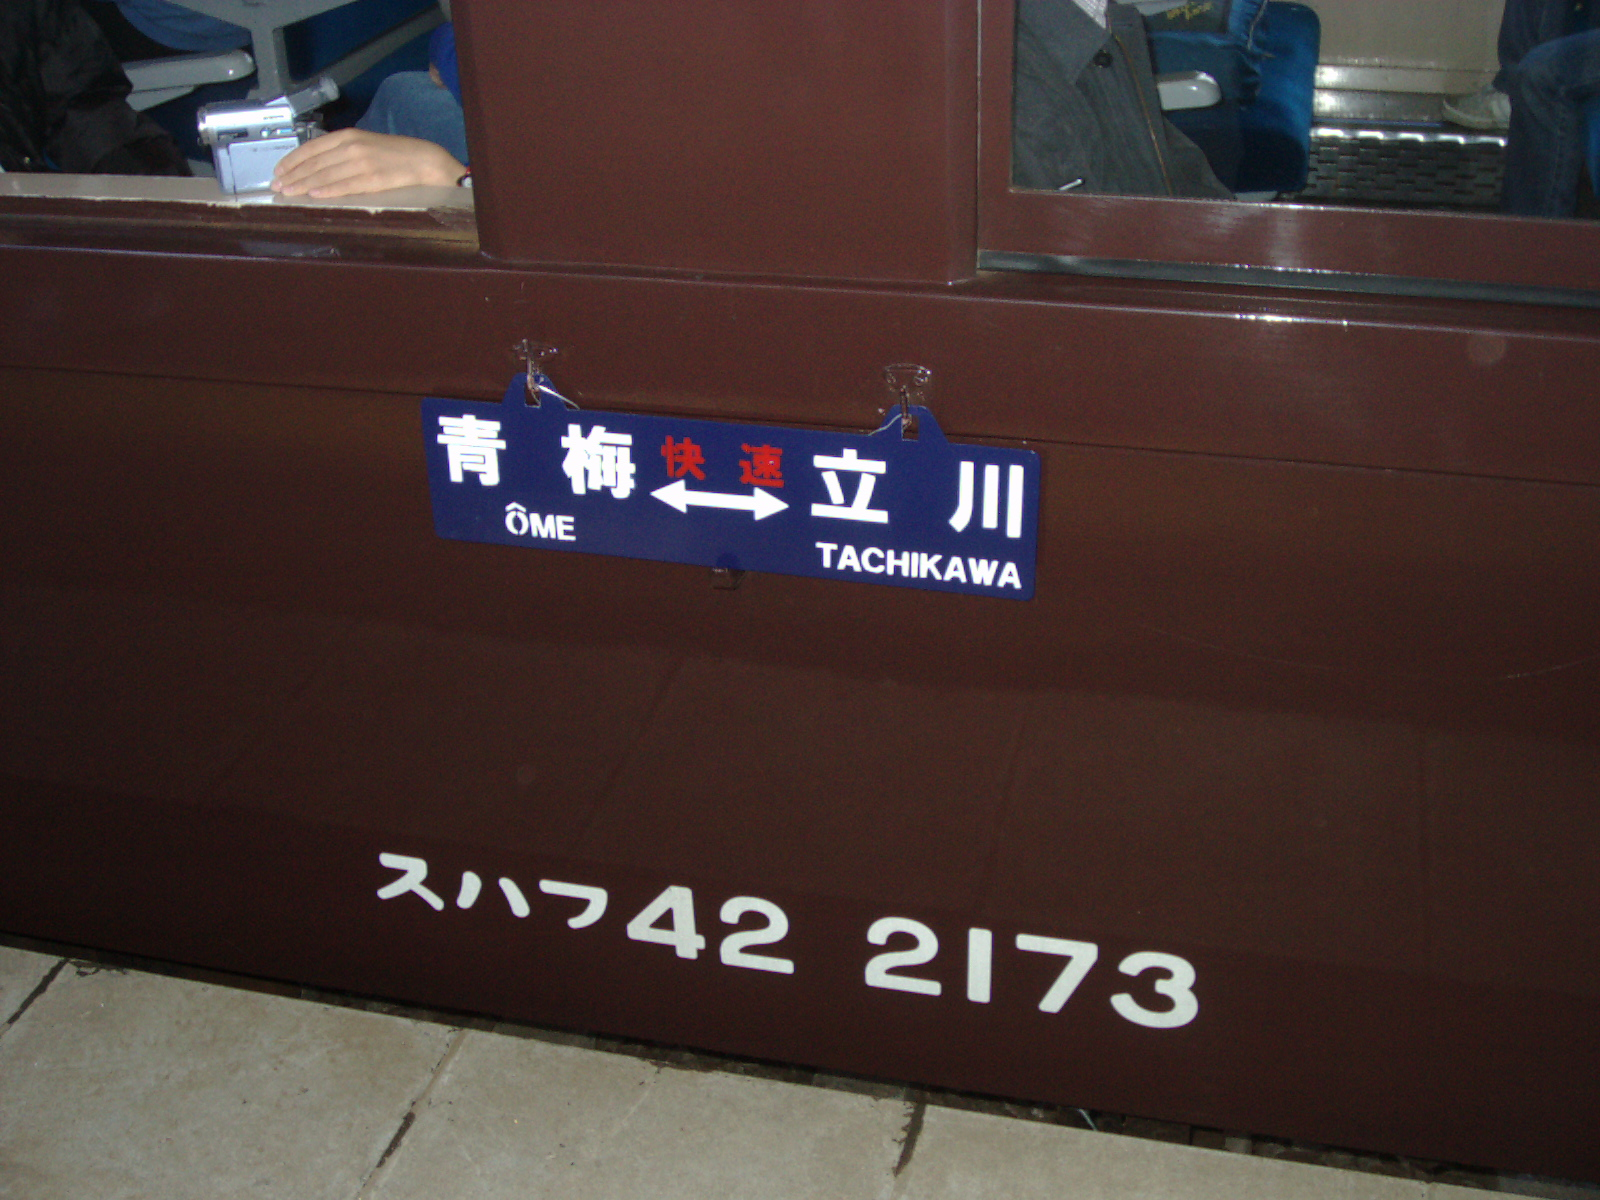 File:Suhafu42-2173.JPG